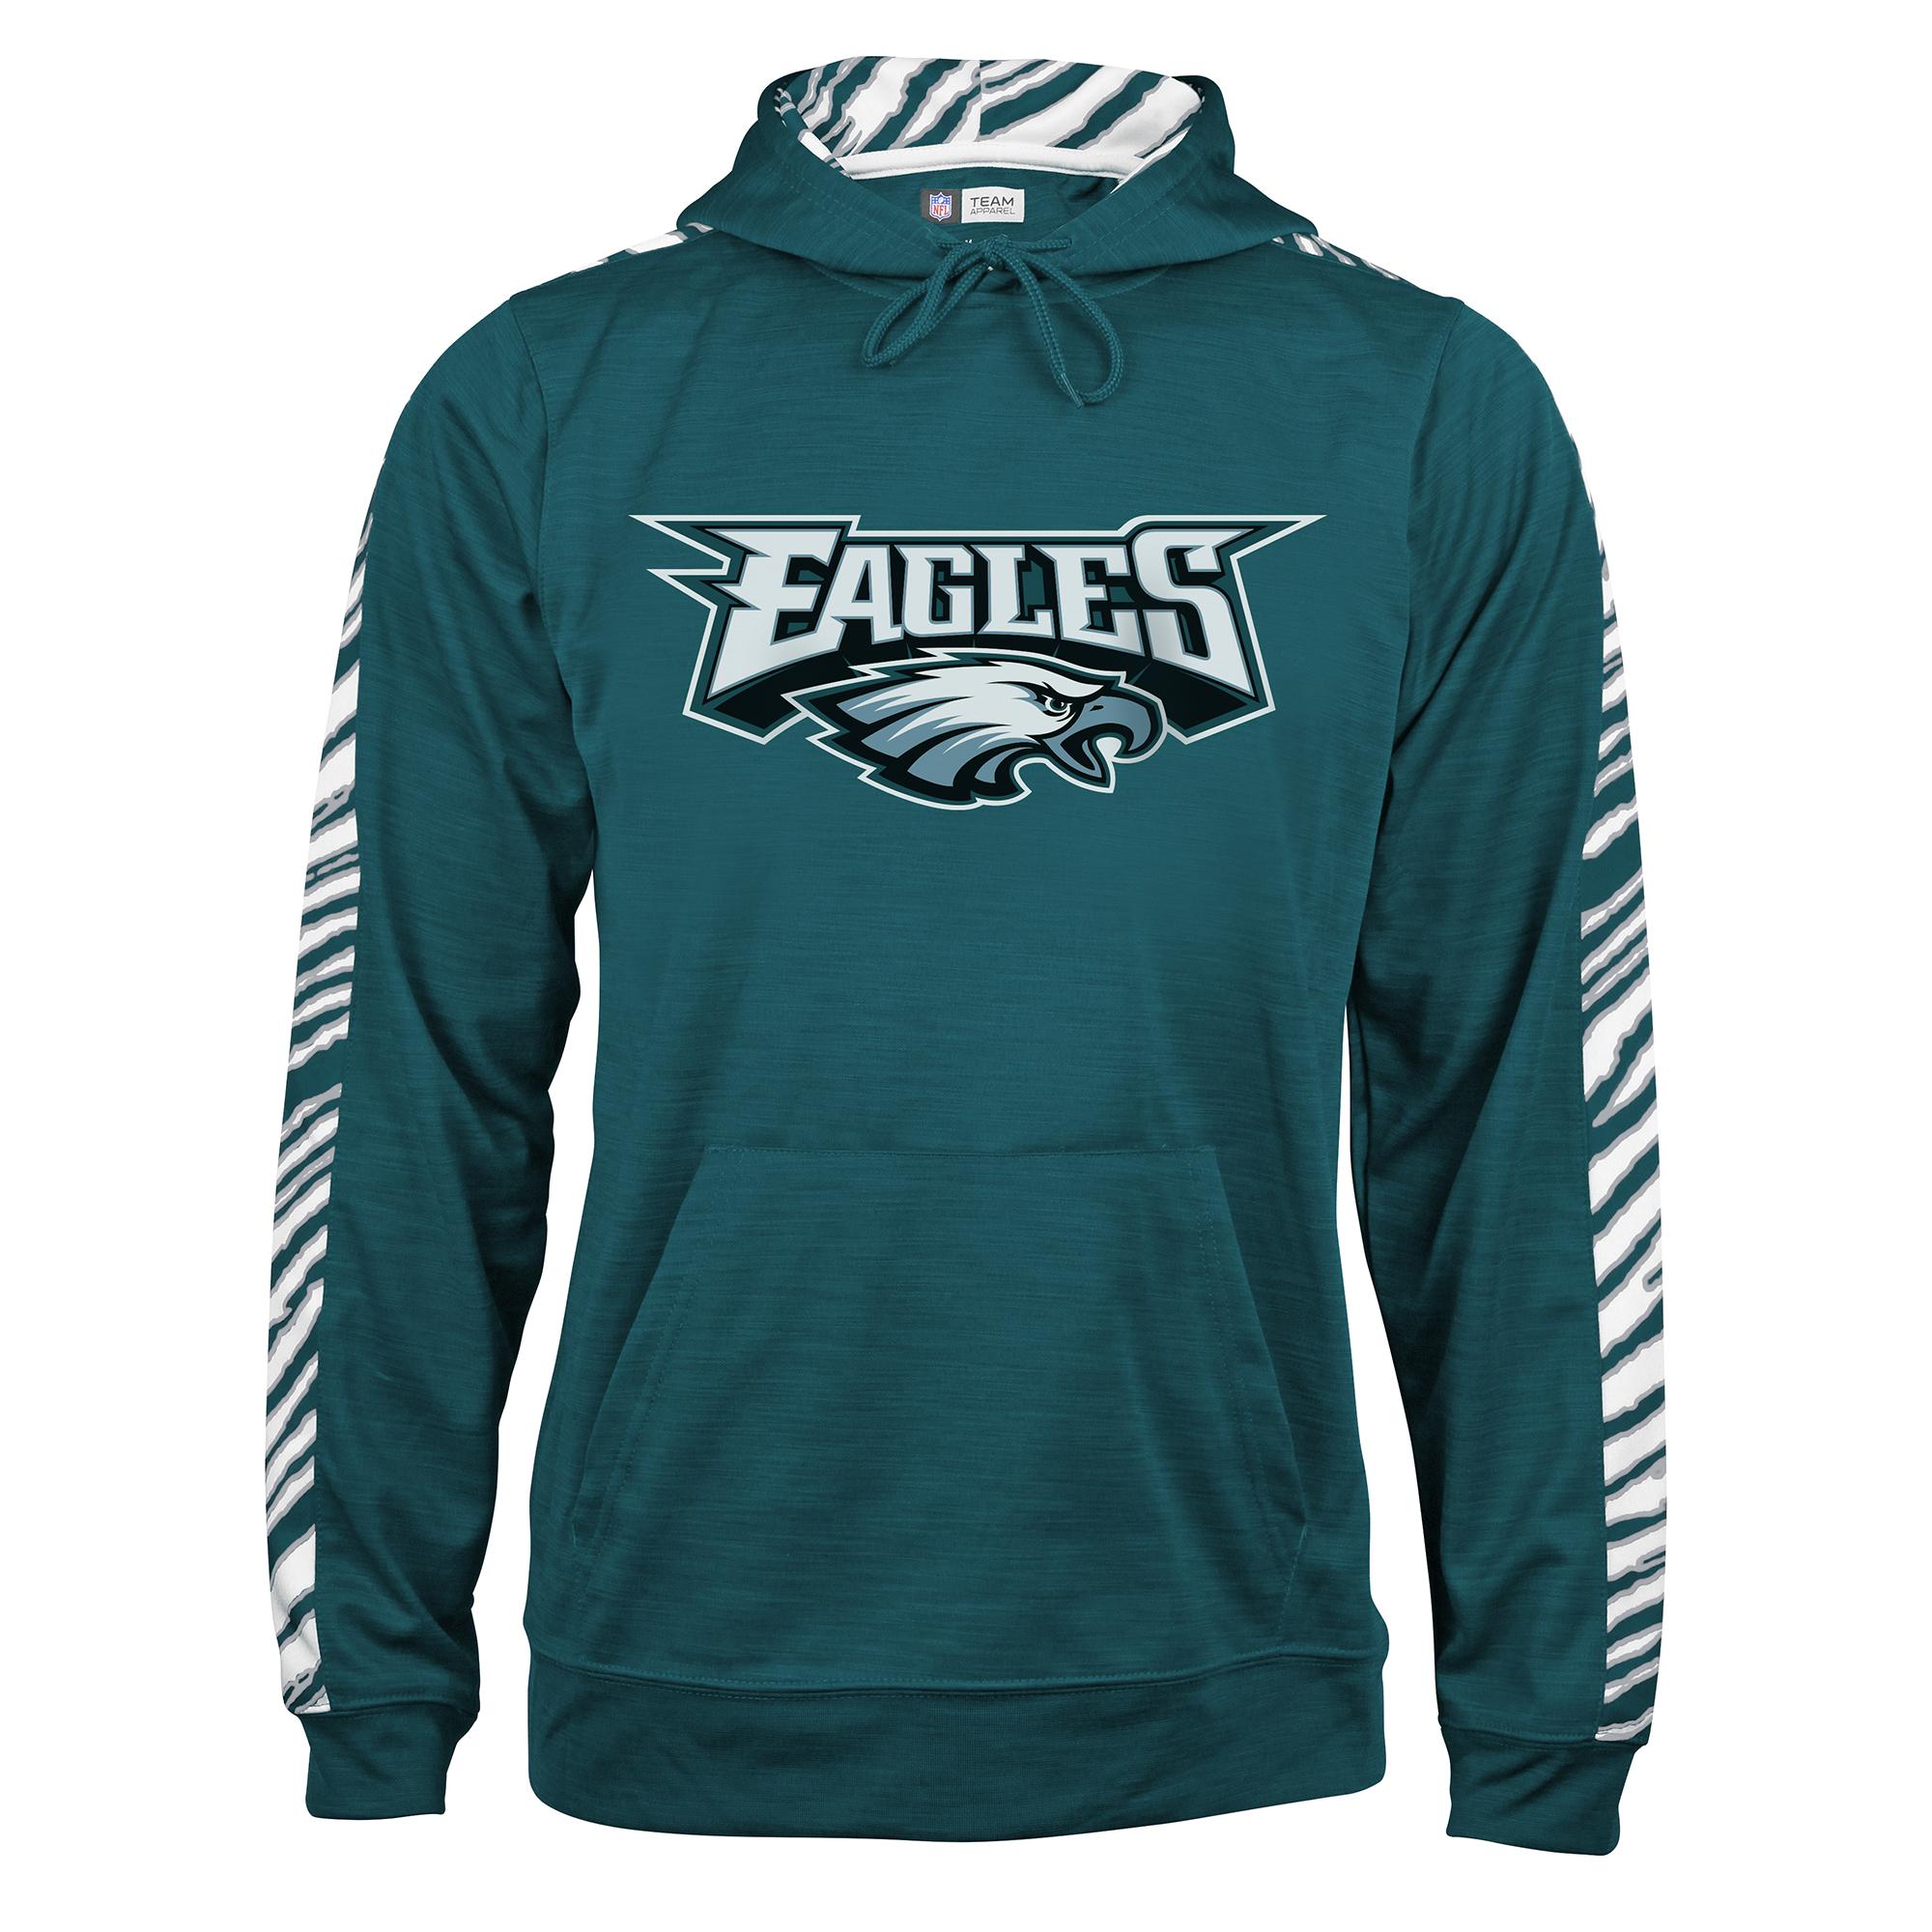 NFL Men's Graphic Slub Hoodie - Philadelphia Eagles PartNumber: 046VA99413812P MfgPartNumber: SNFL24SLZ510635